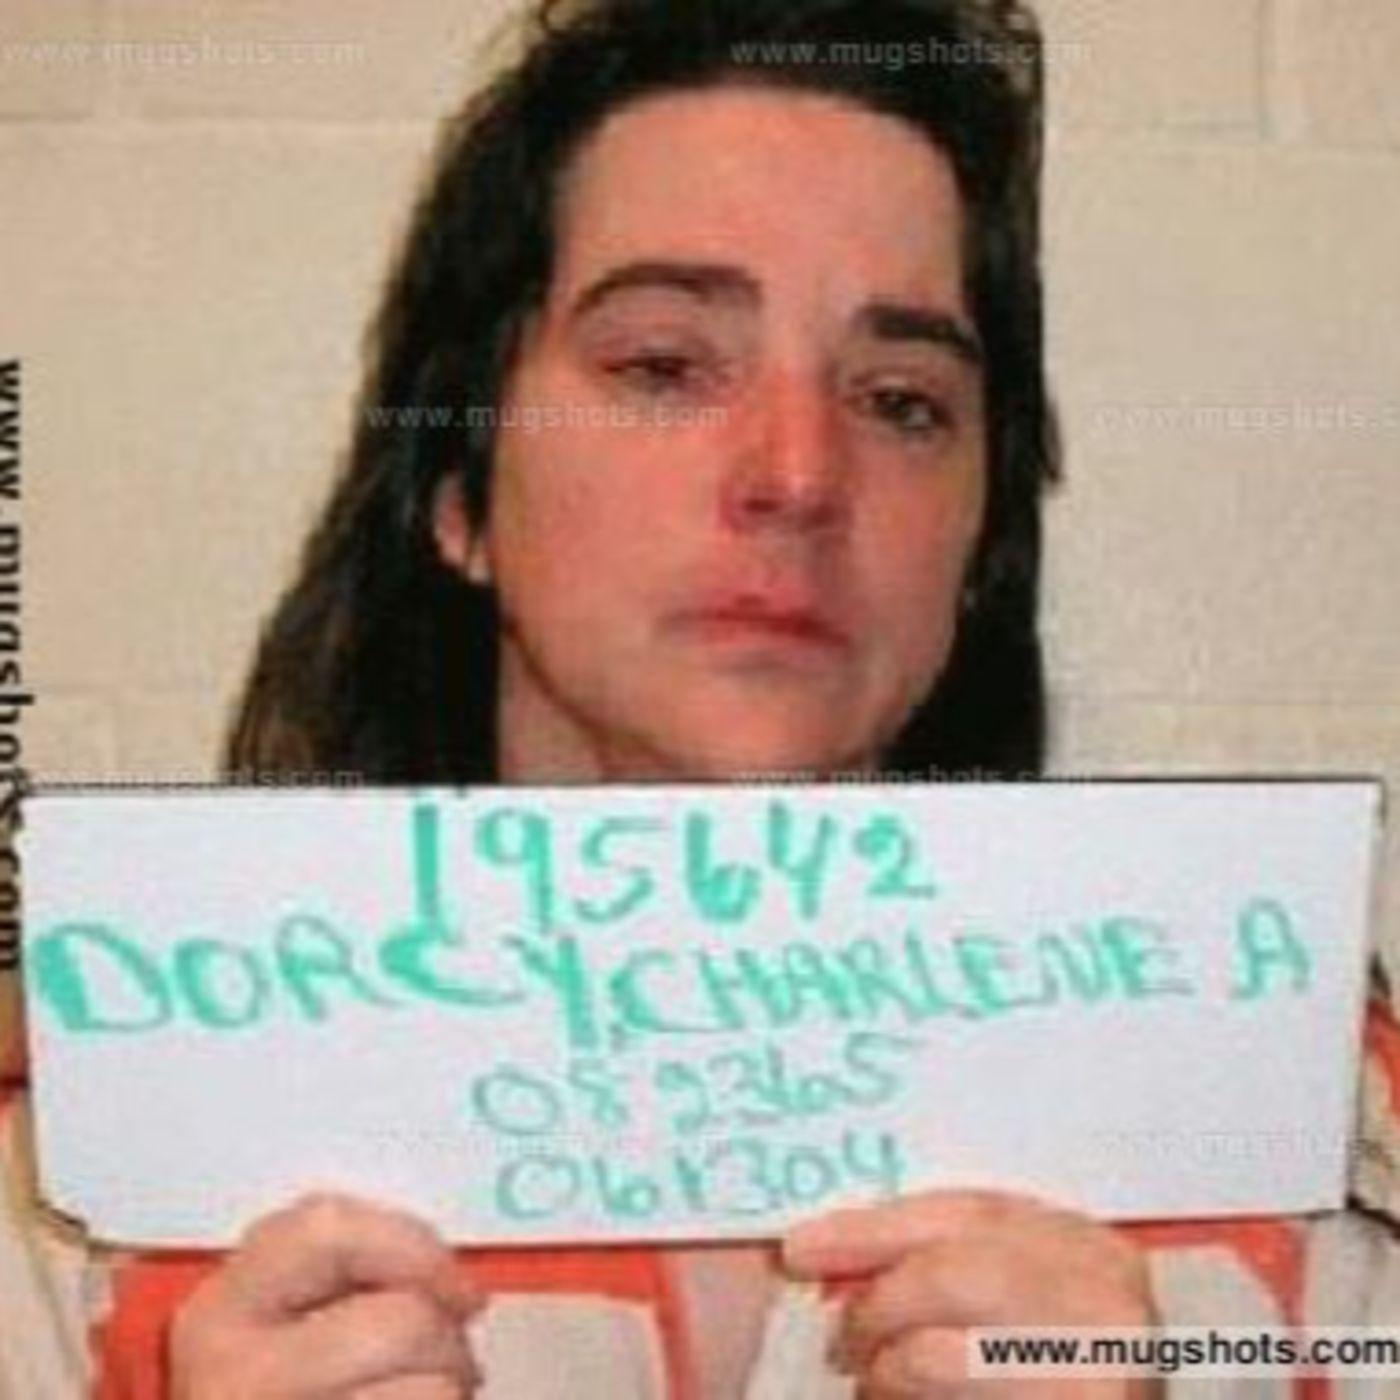 Interview with double child murderer Charlene Dorcy